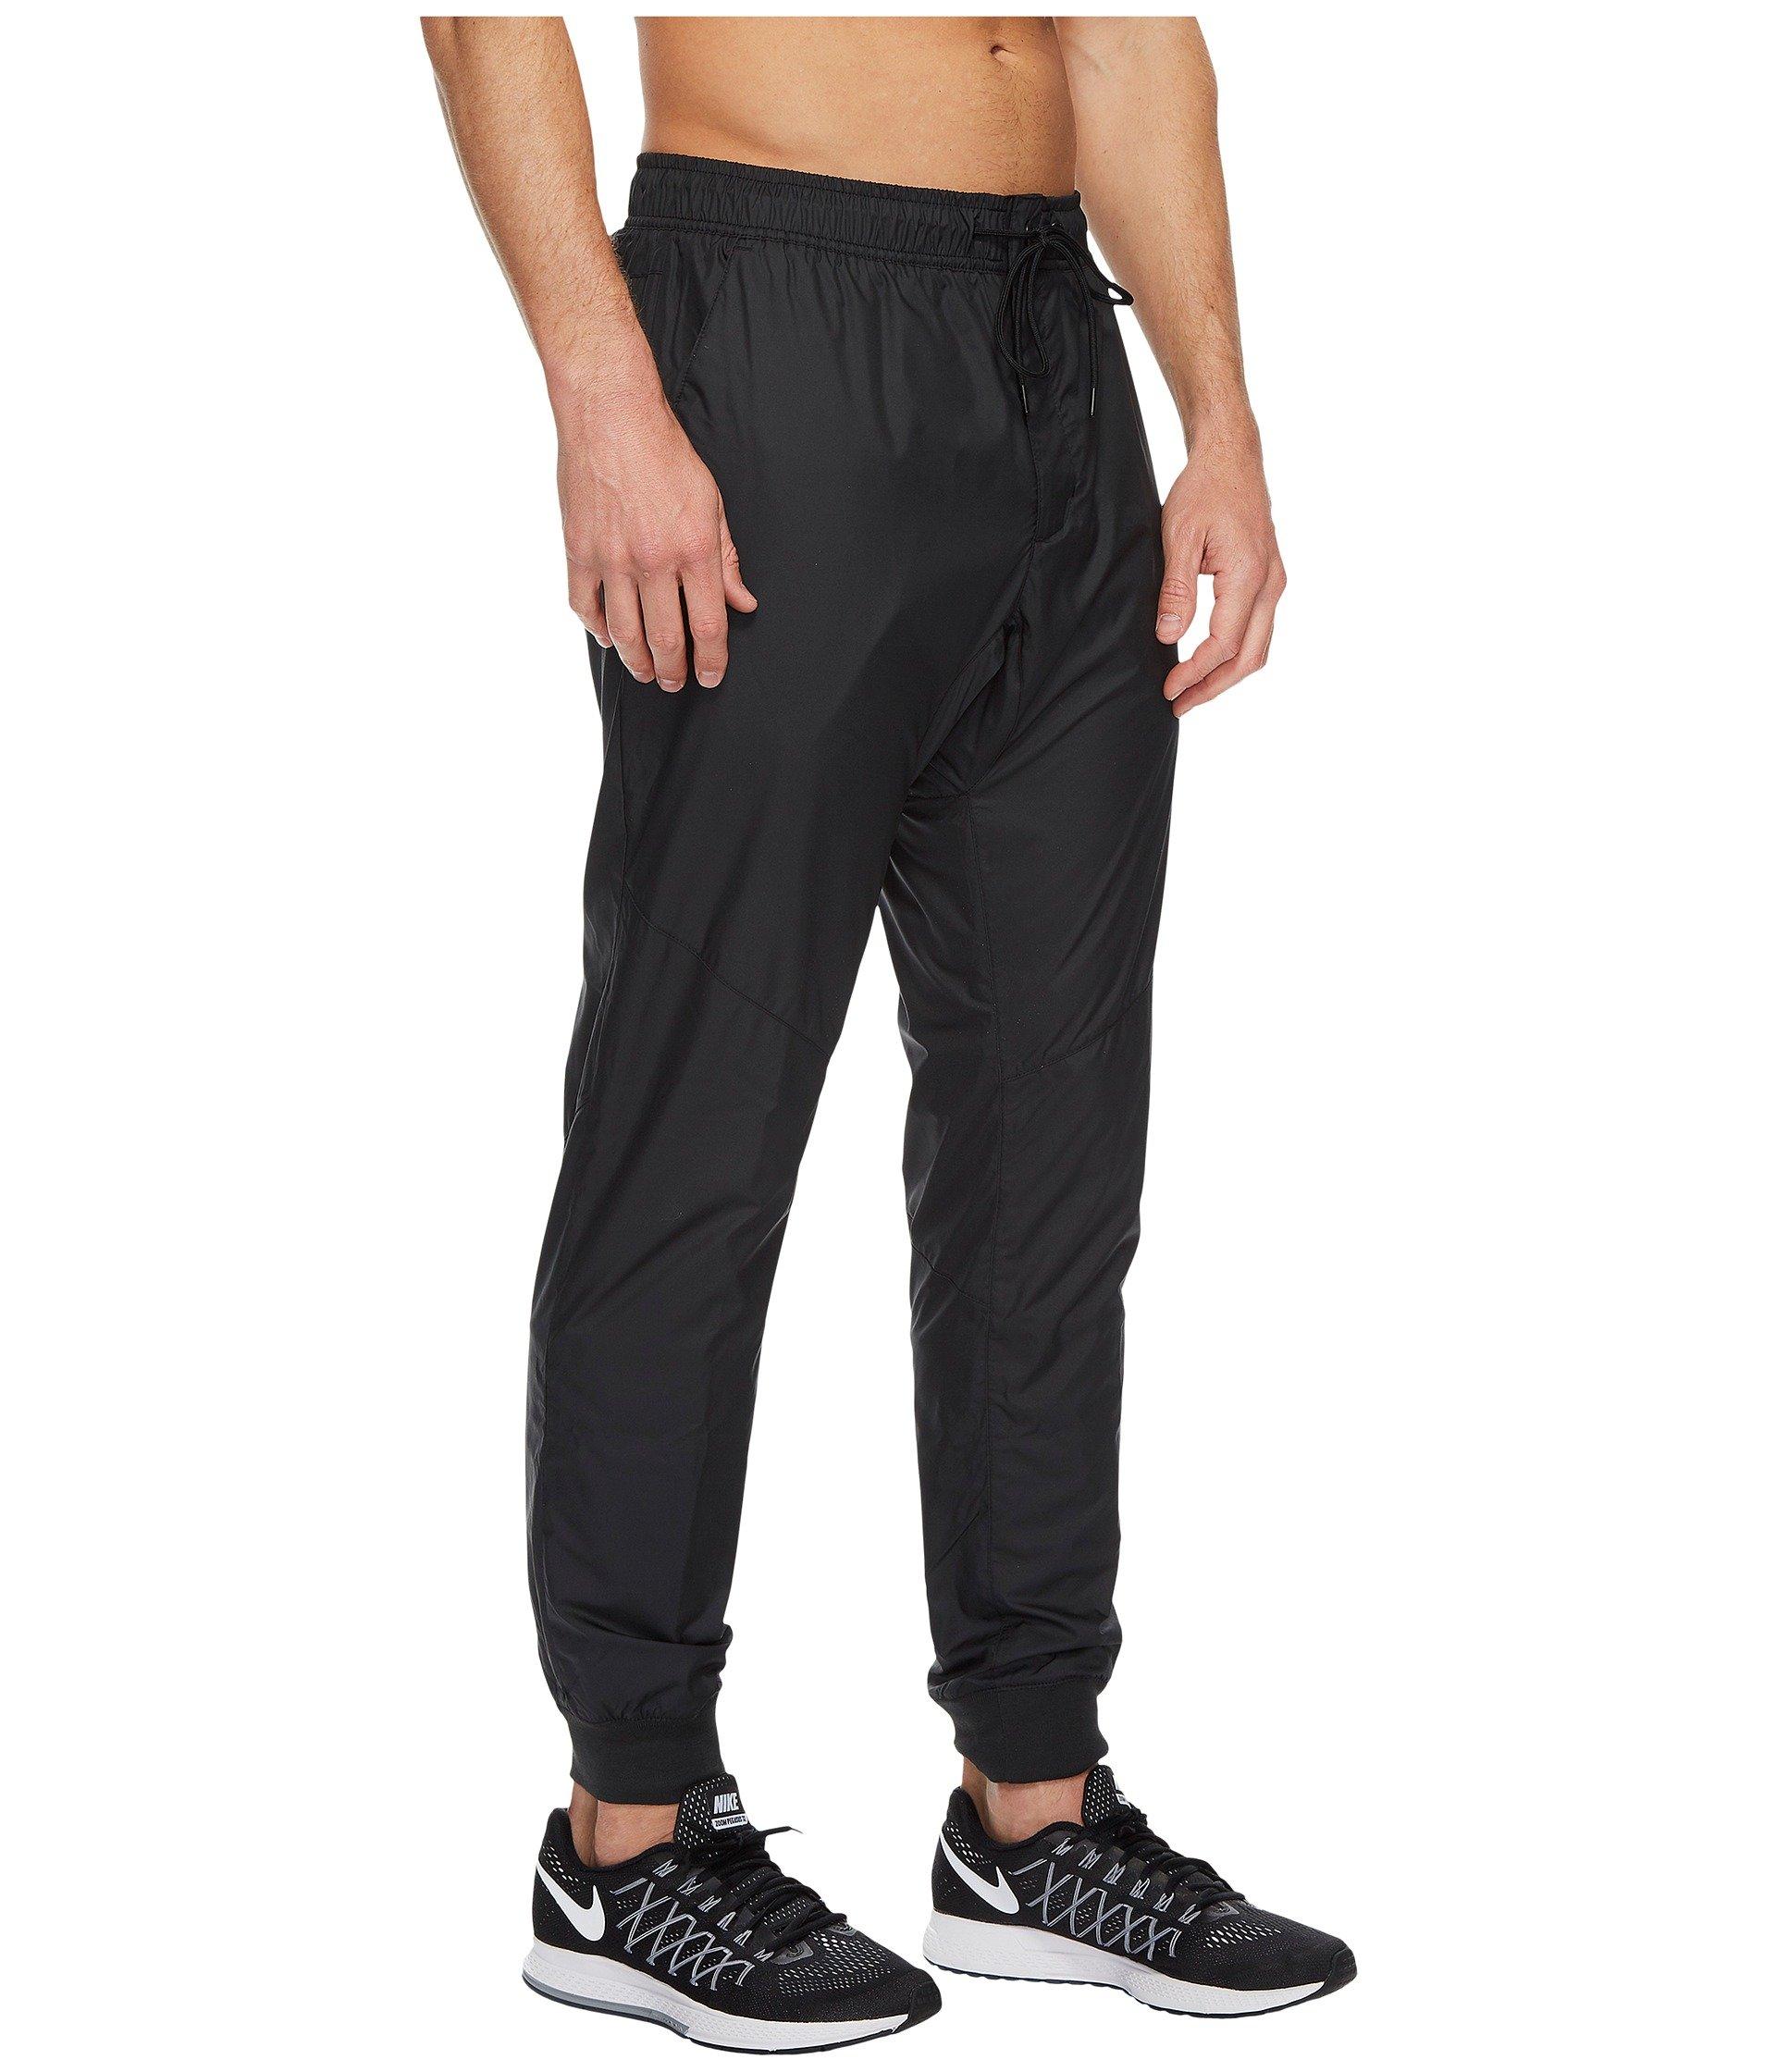 new arrival 17b72 e5f12 Nike Sportswear Windrunner Mens Pants